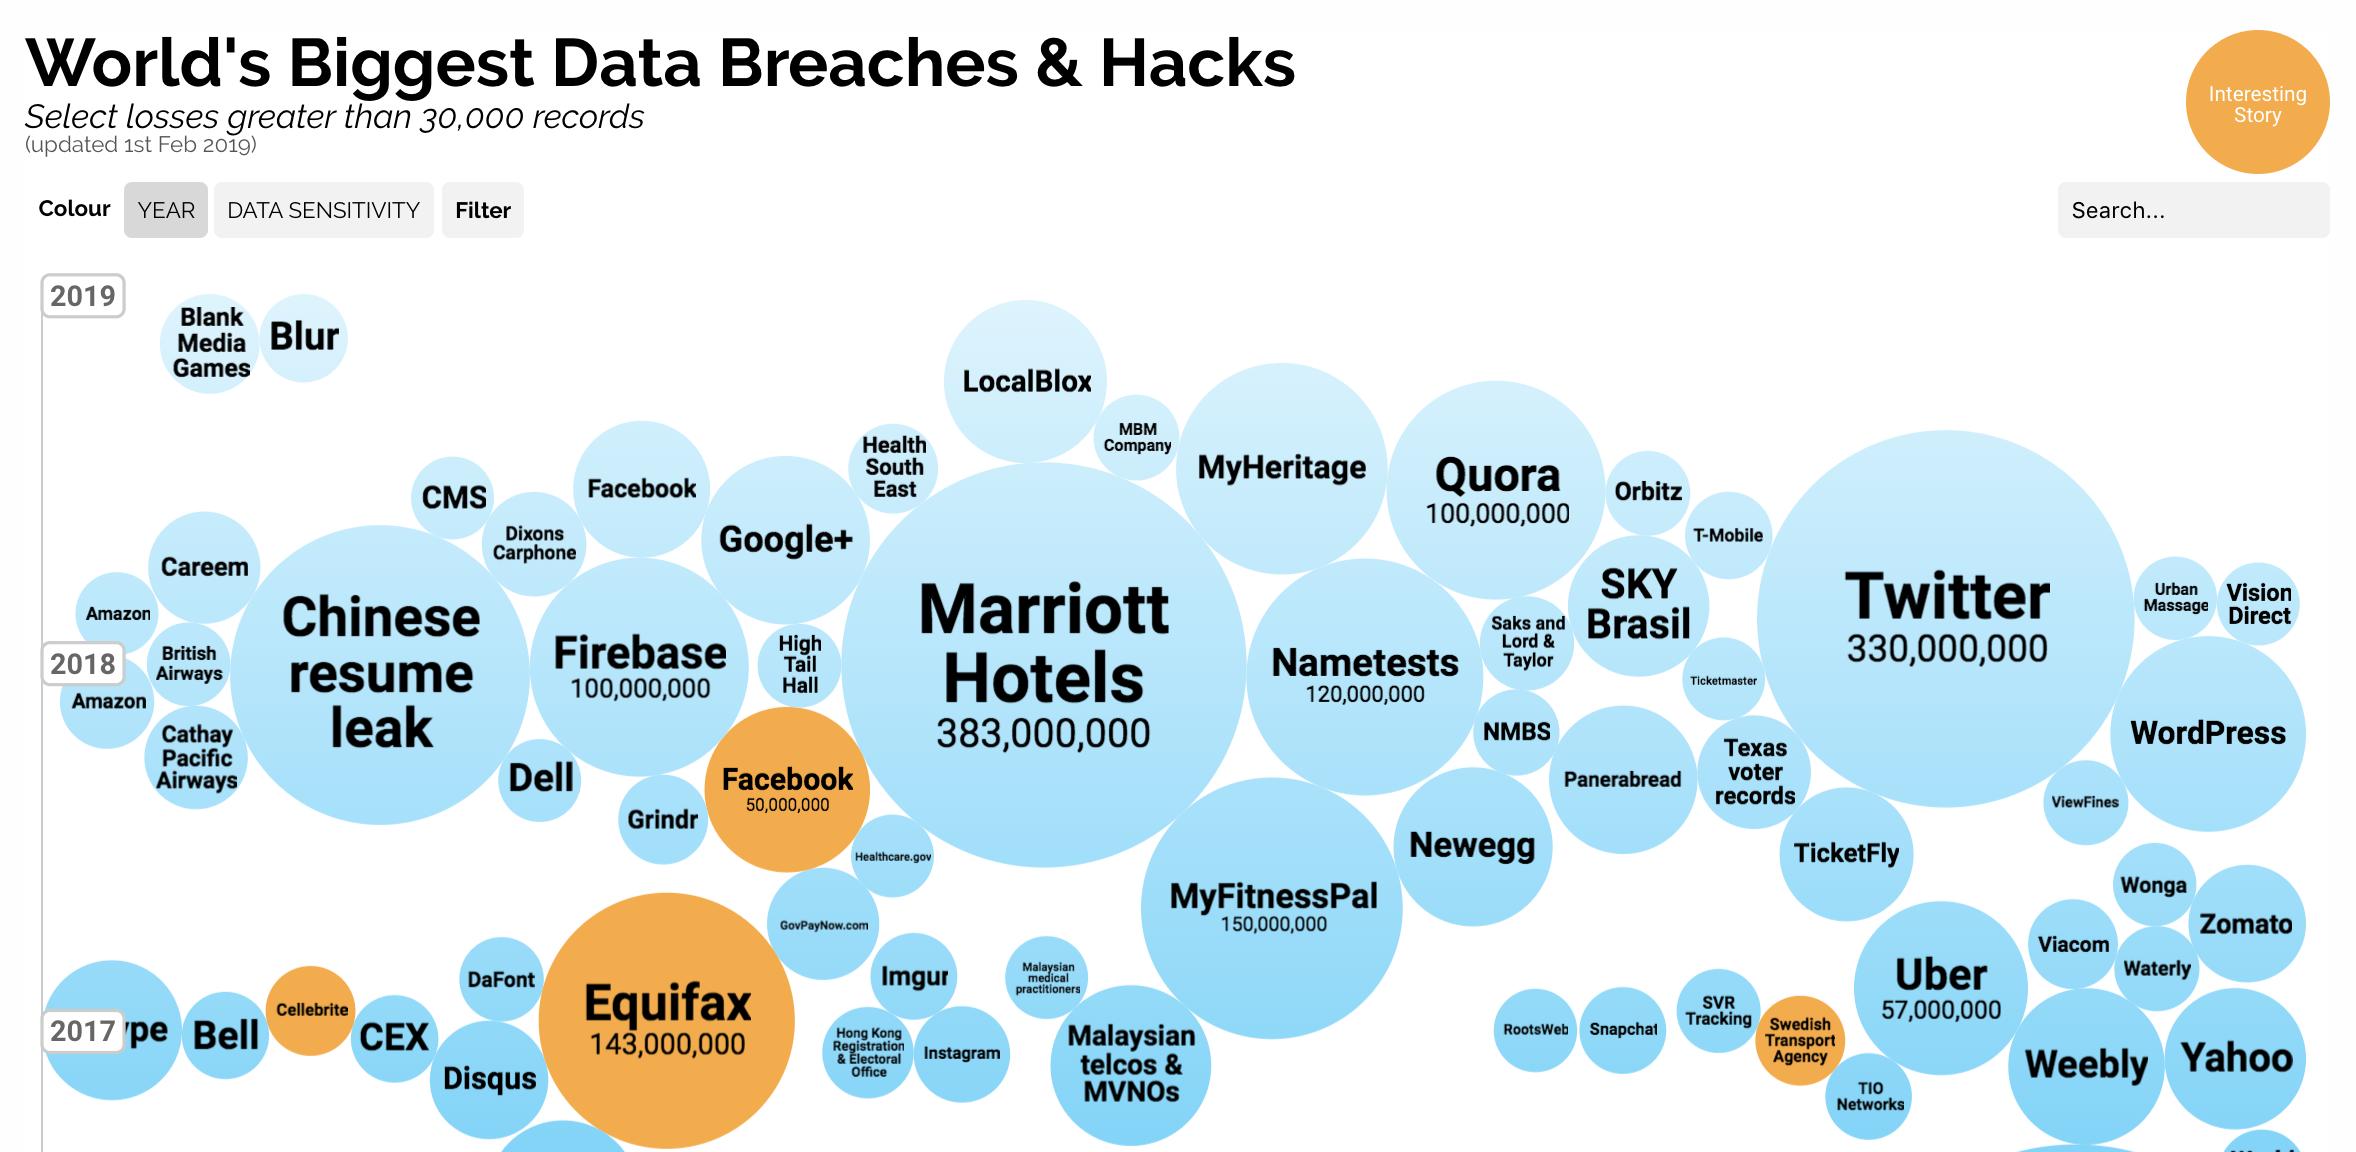 https://informationisbeautiful.net/visualizations/worlds-biggest-data-breaches-hacks/